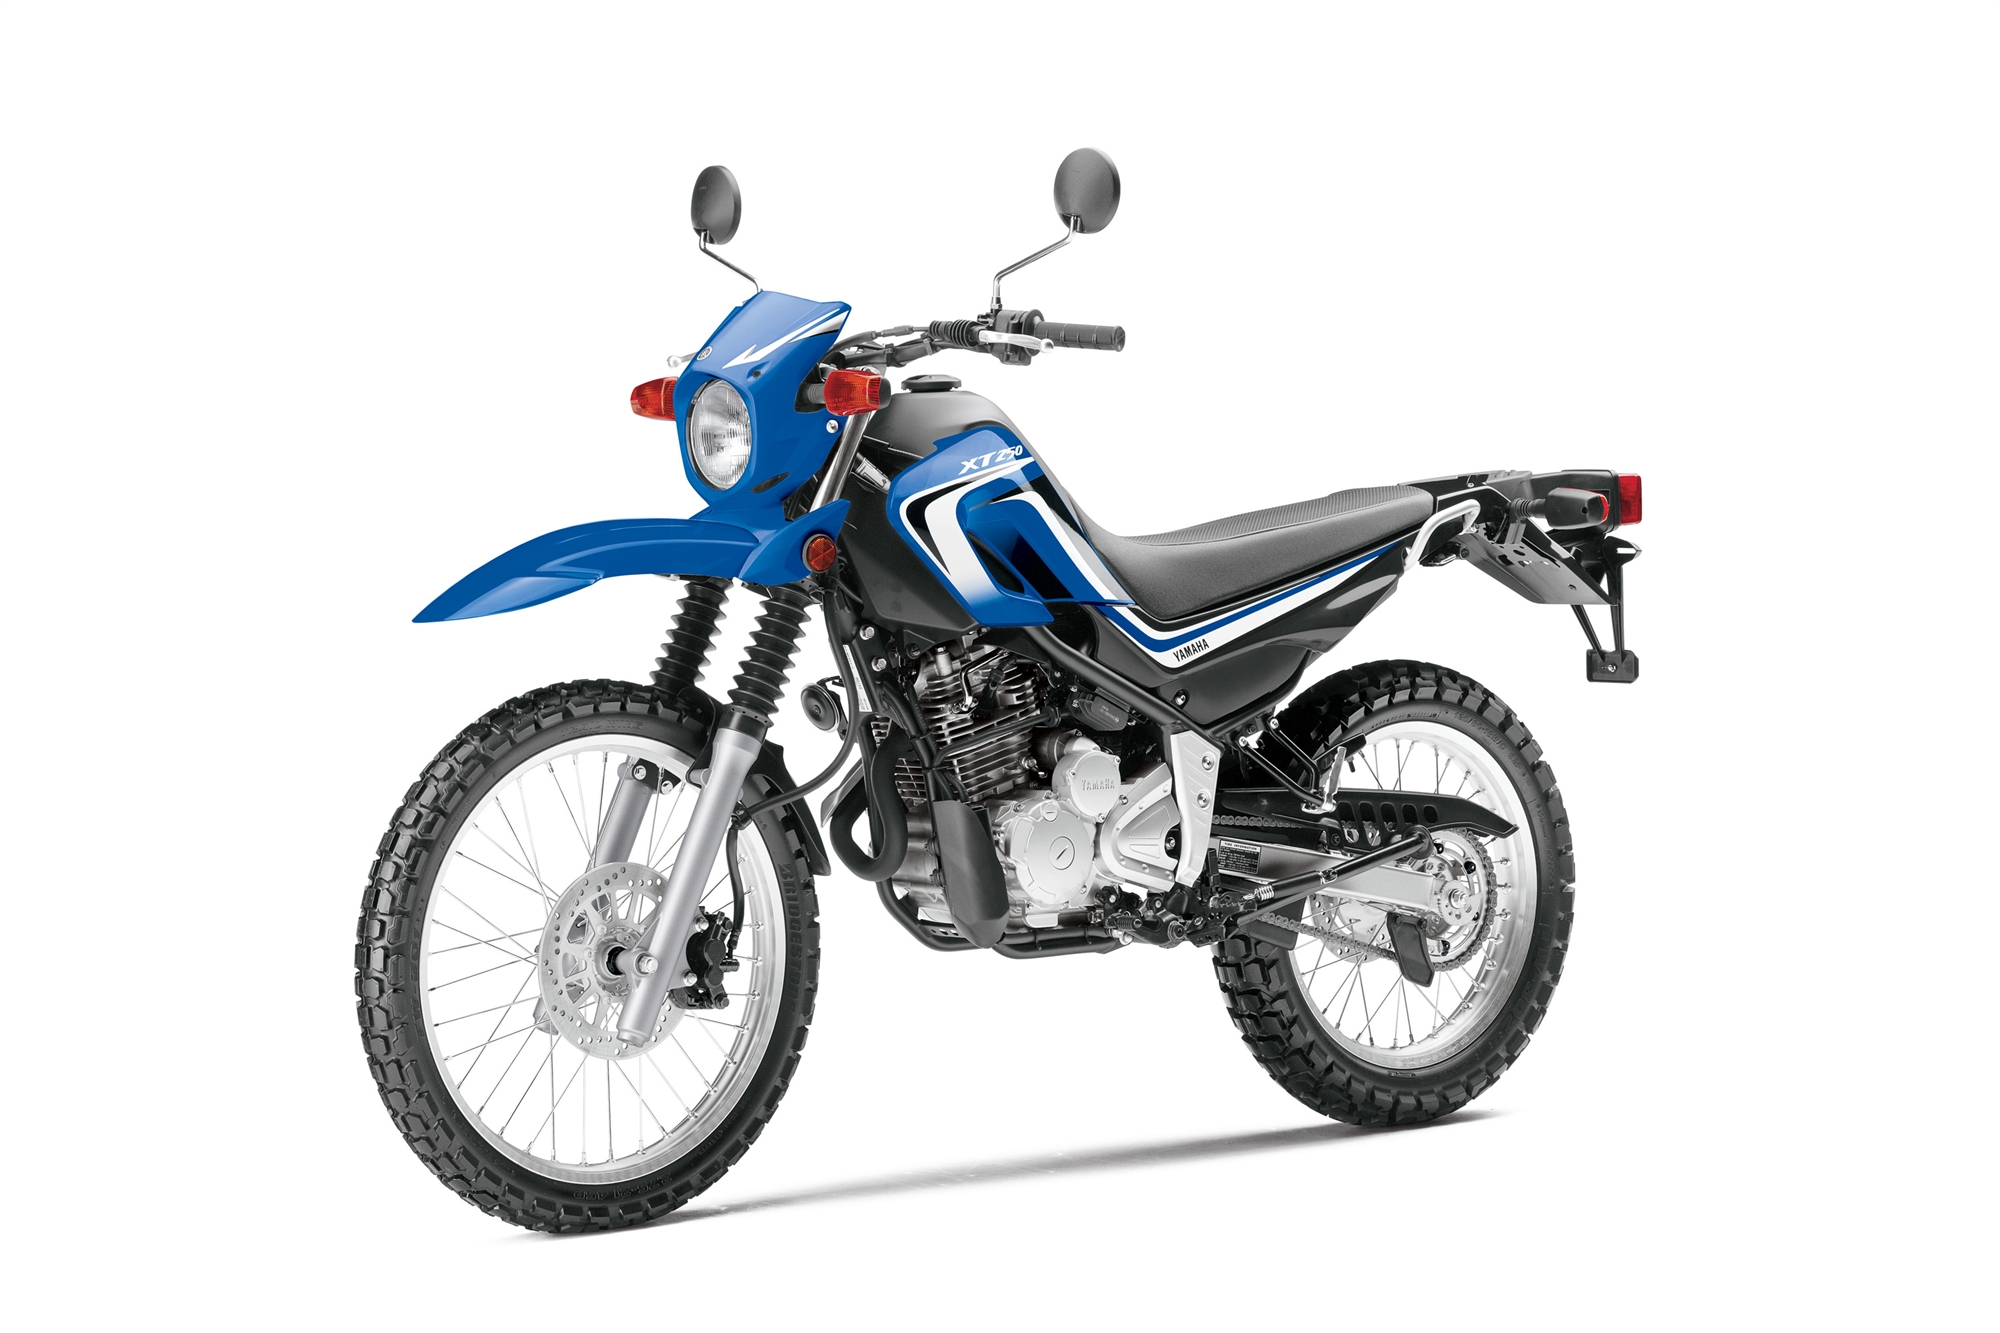 Yamaha Xt250 Specs 2013 2014 Autoevolution